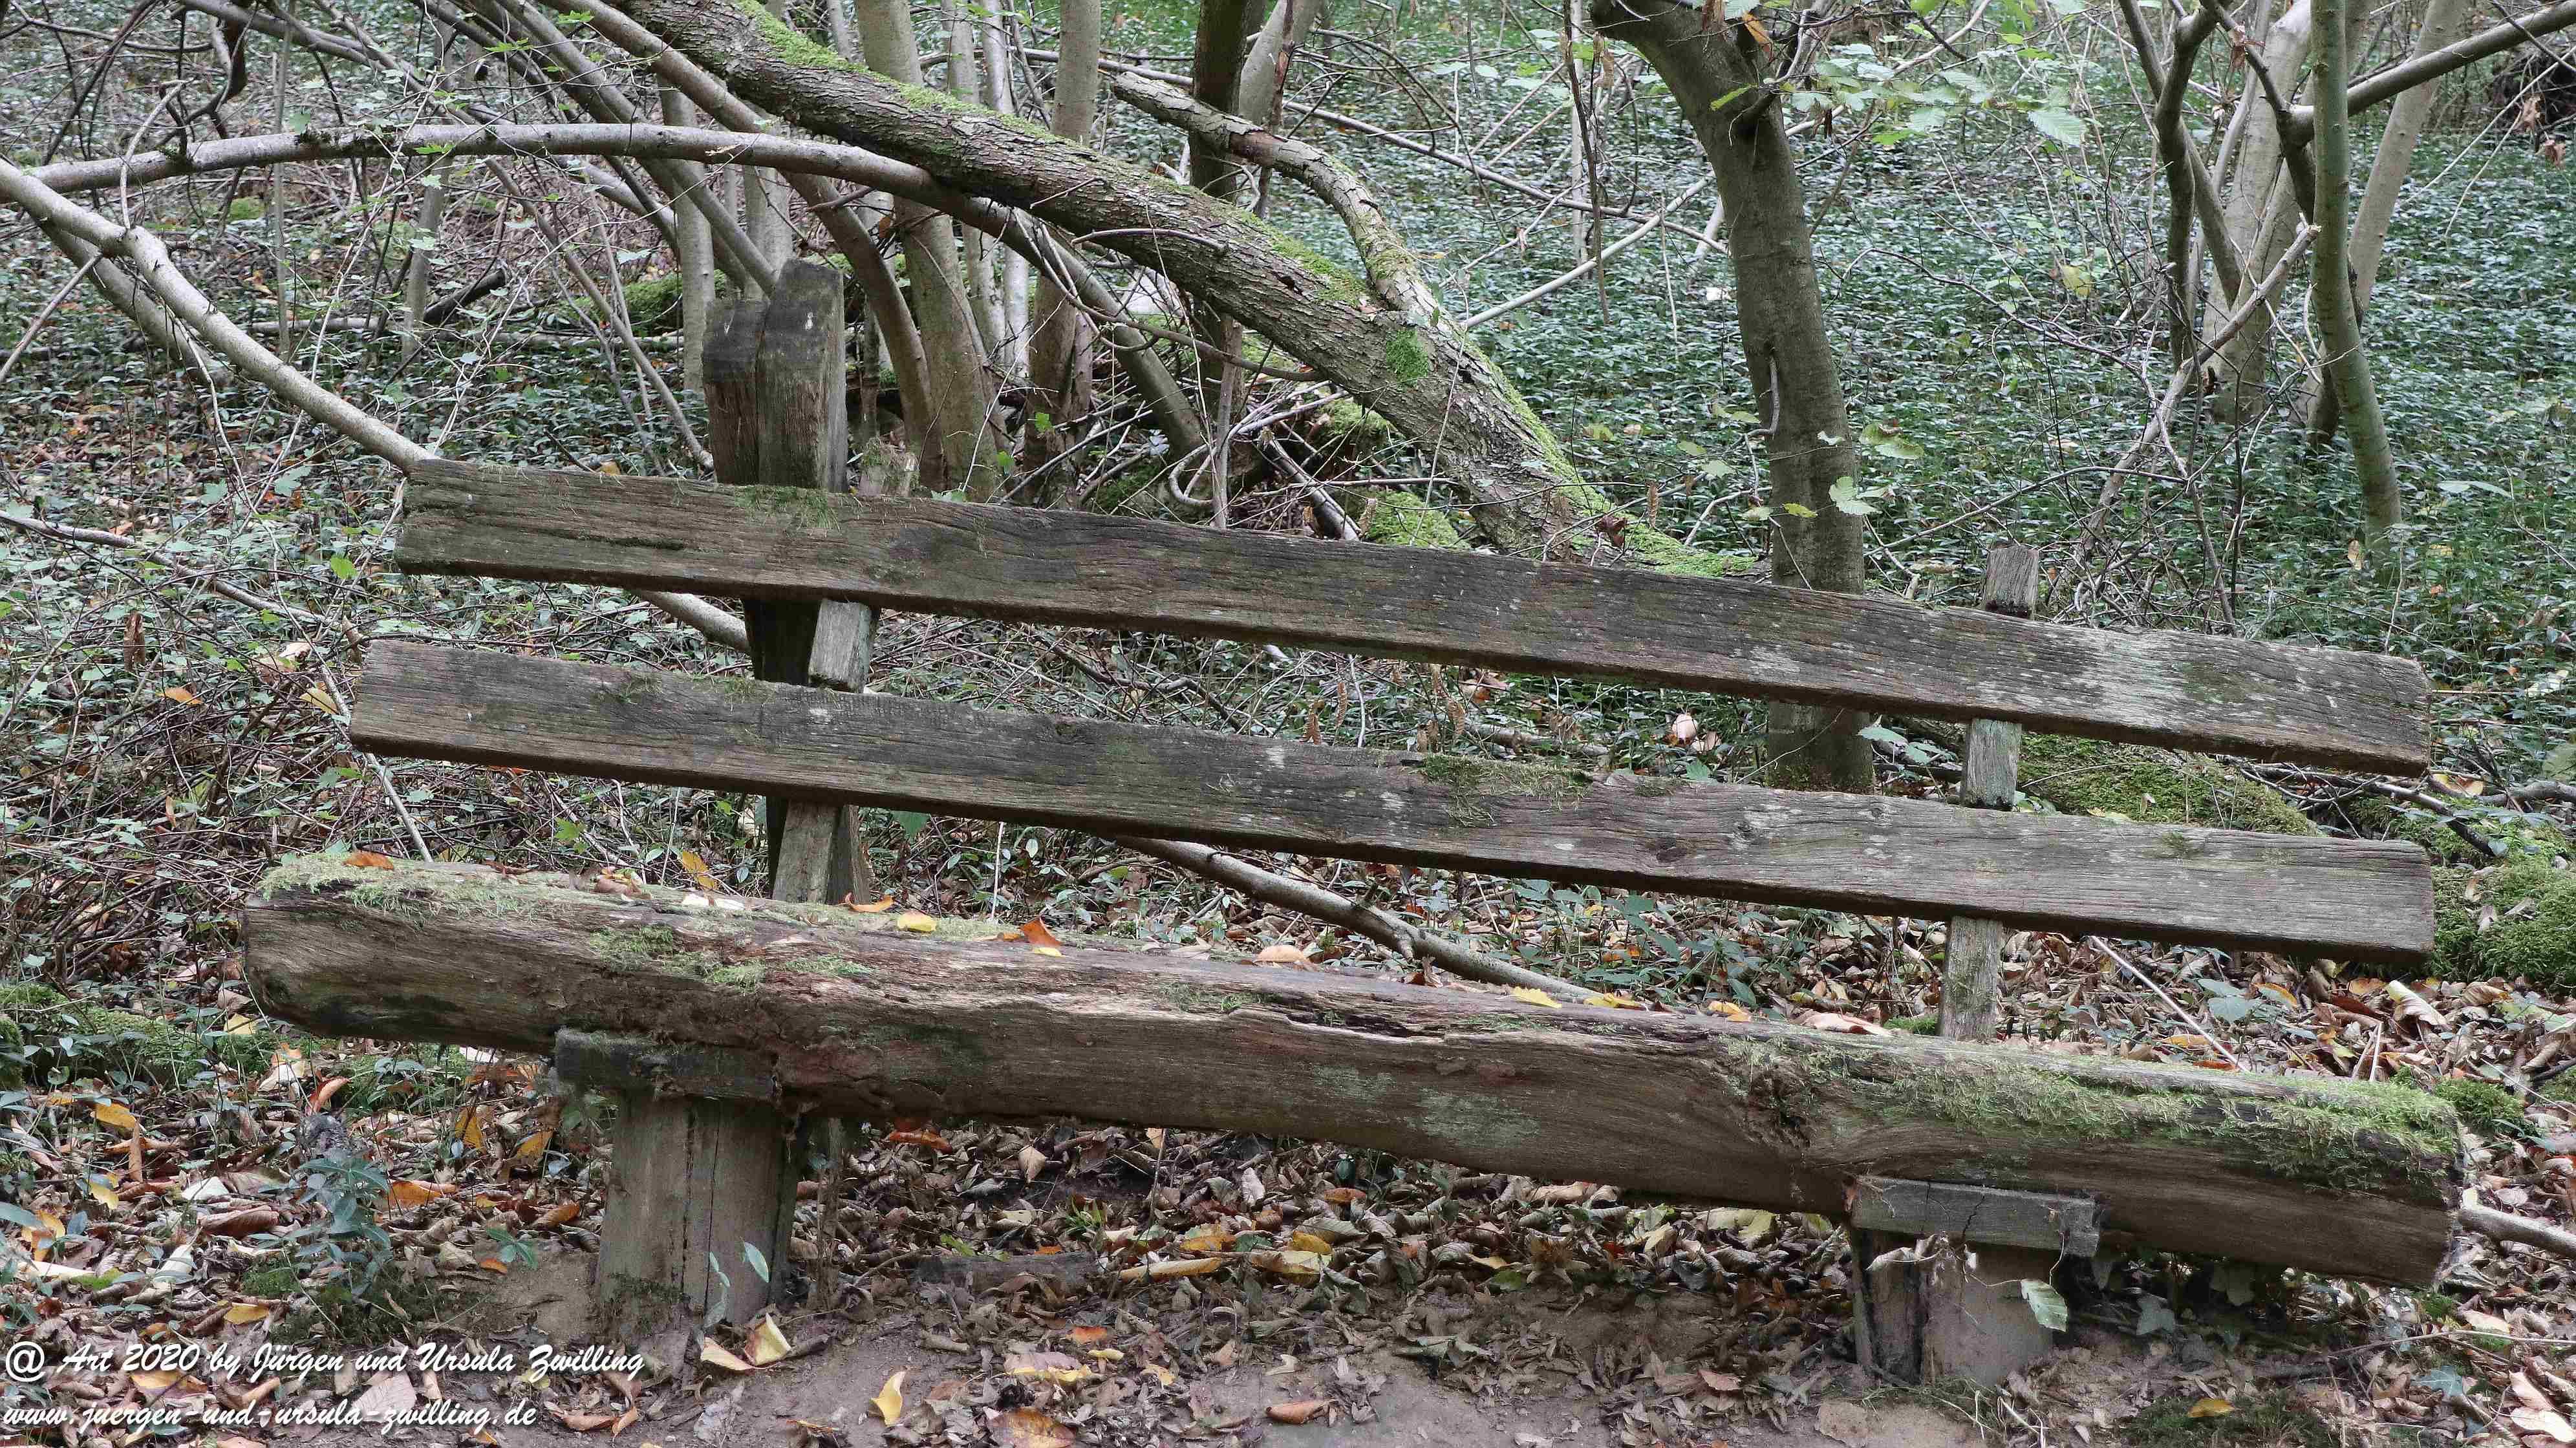 Herbst im Ober Olmer Wald 10